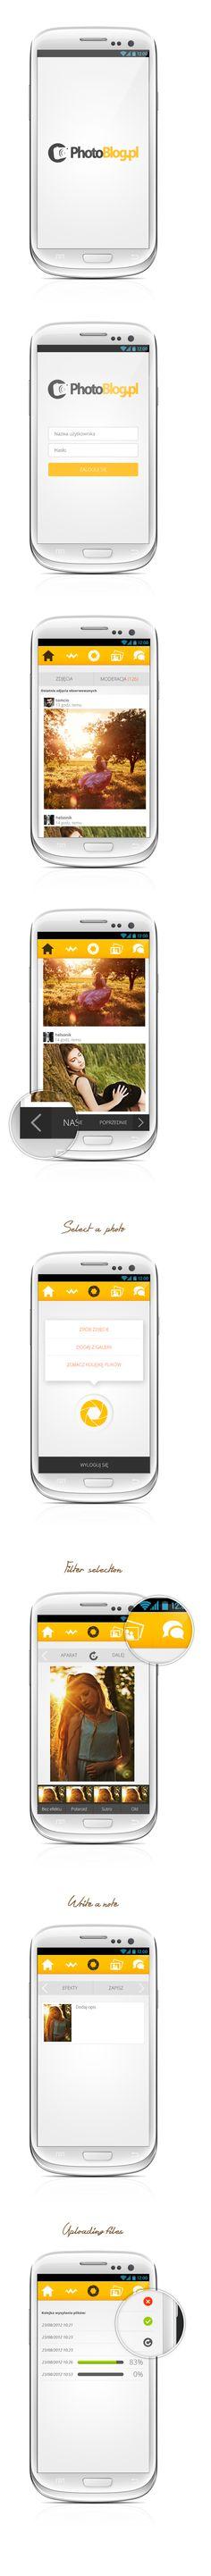 Photoblog.pl - Android mobile application by Bartek Bielawa